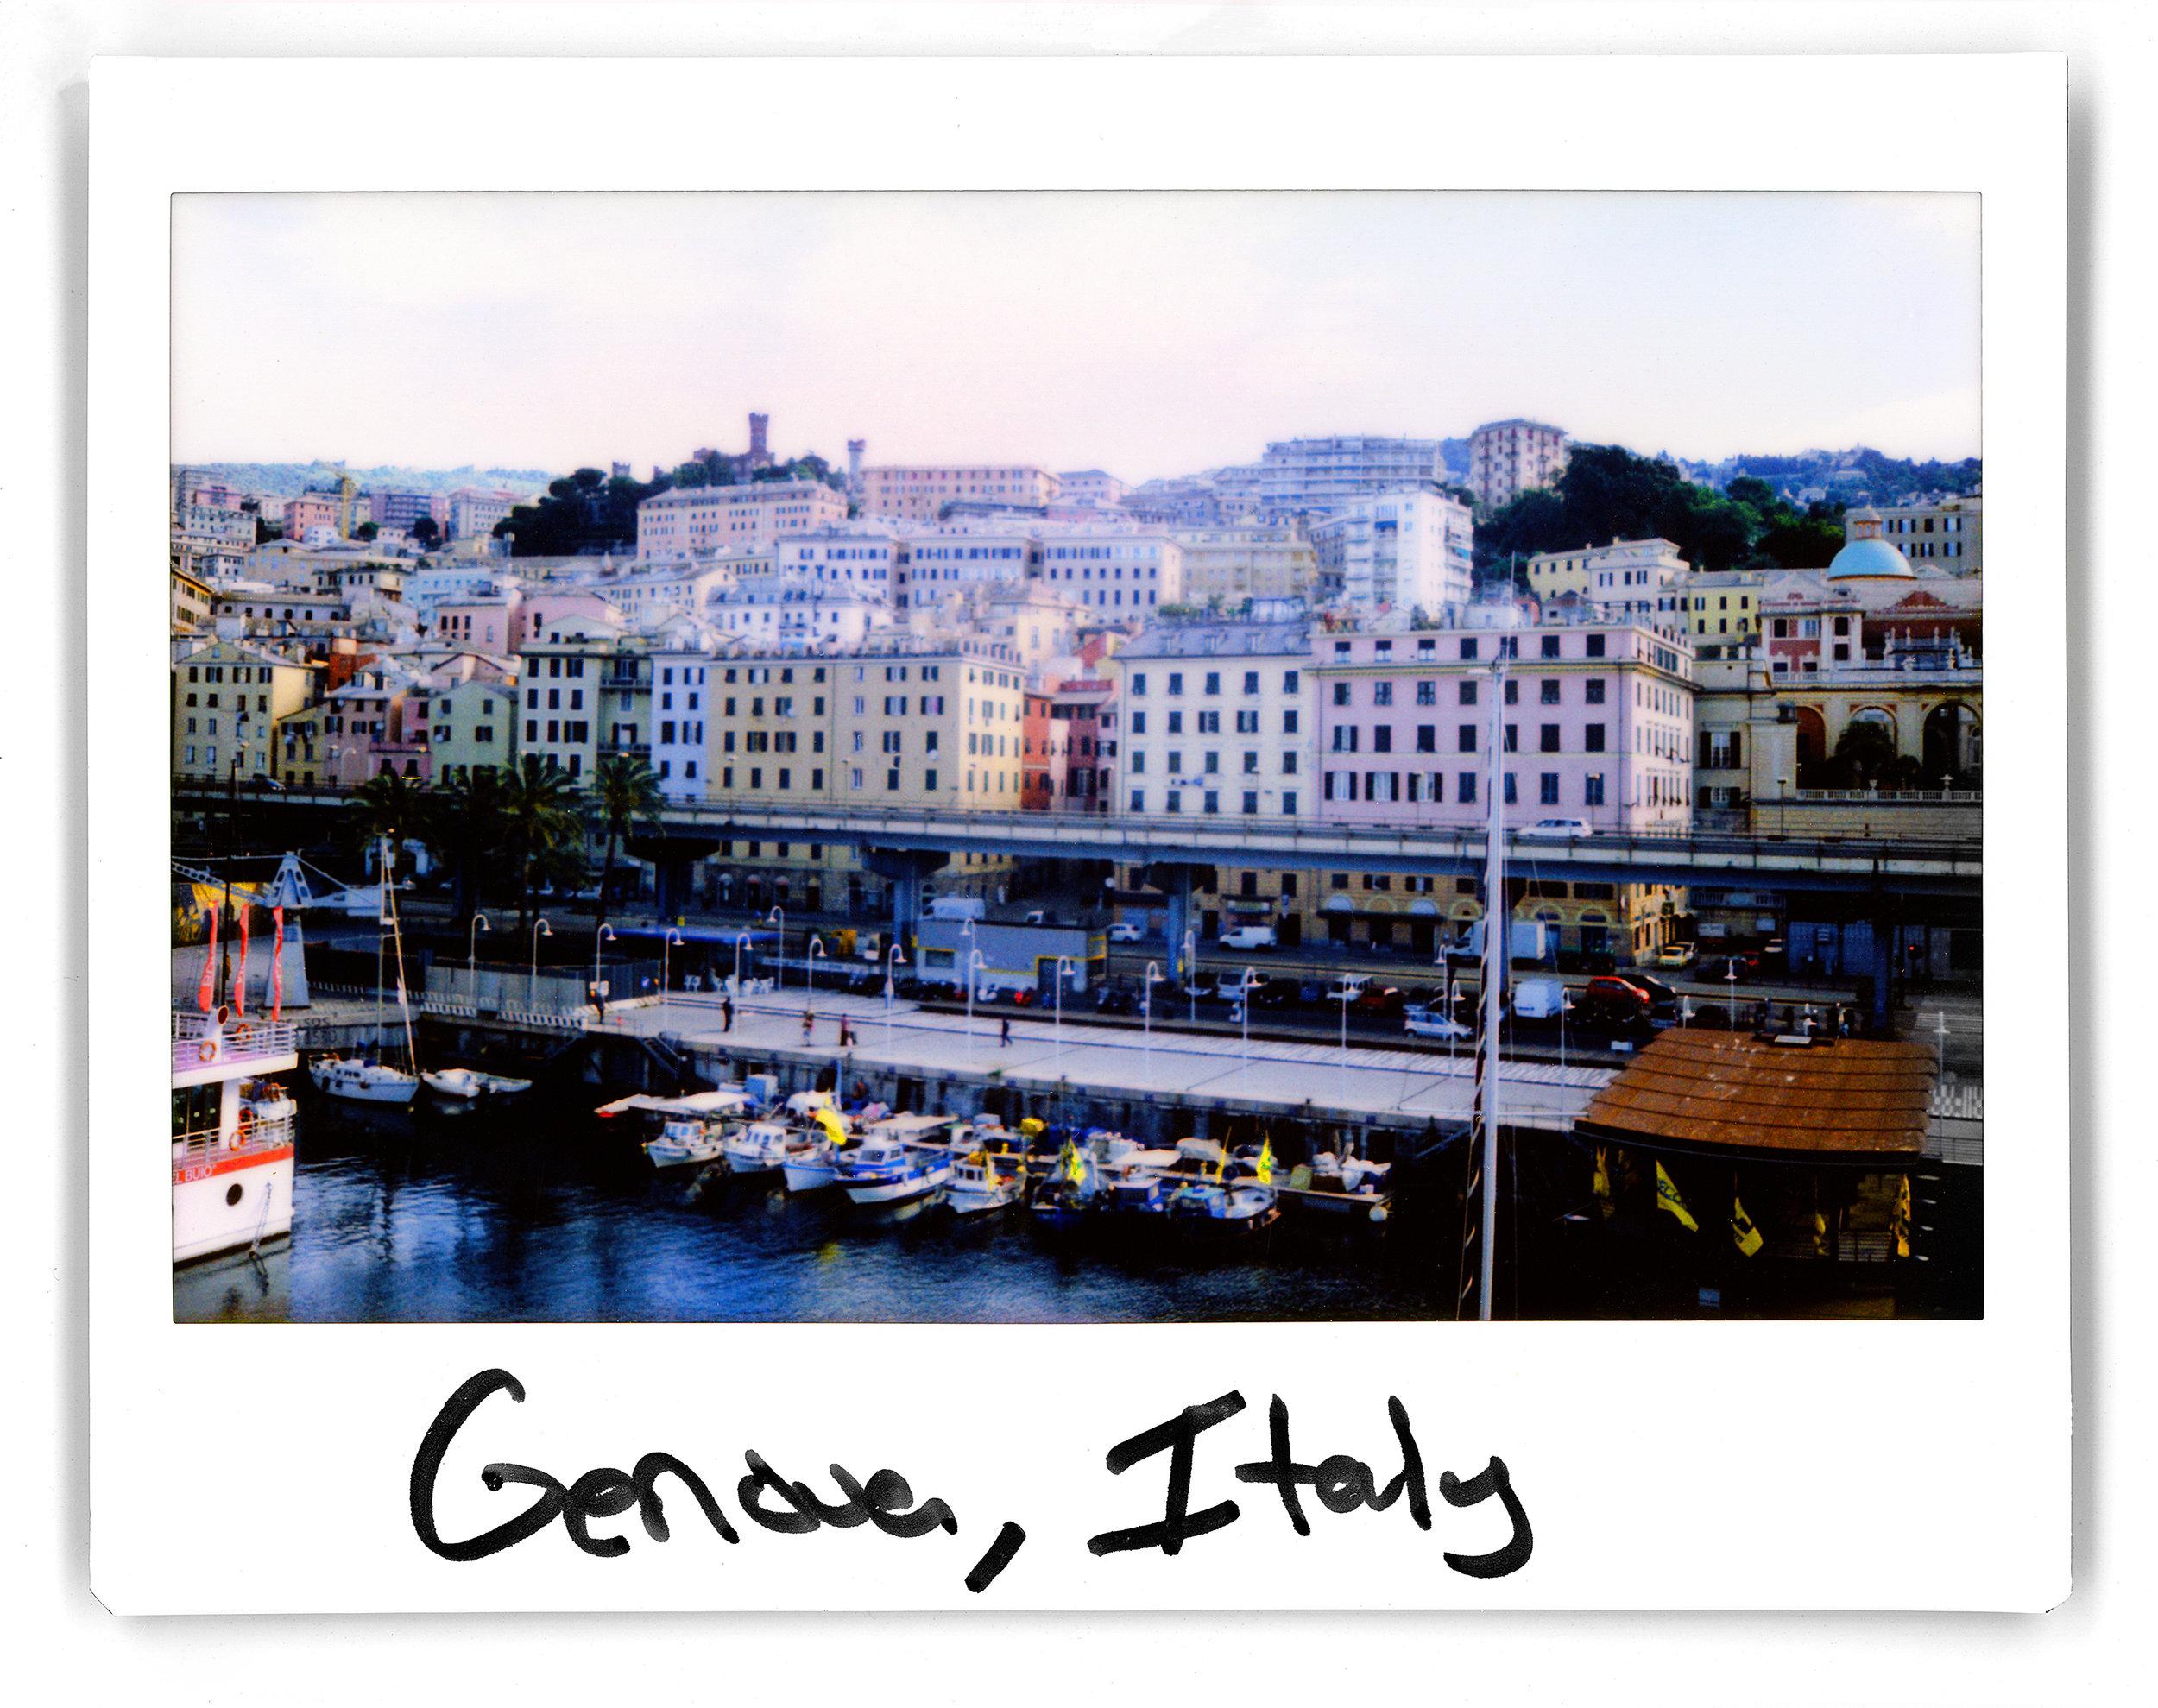 61_Genova copy.jpg